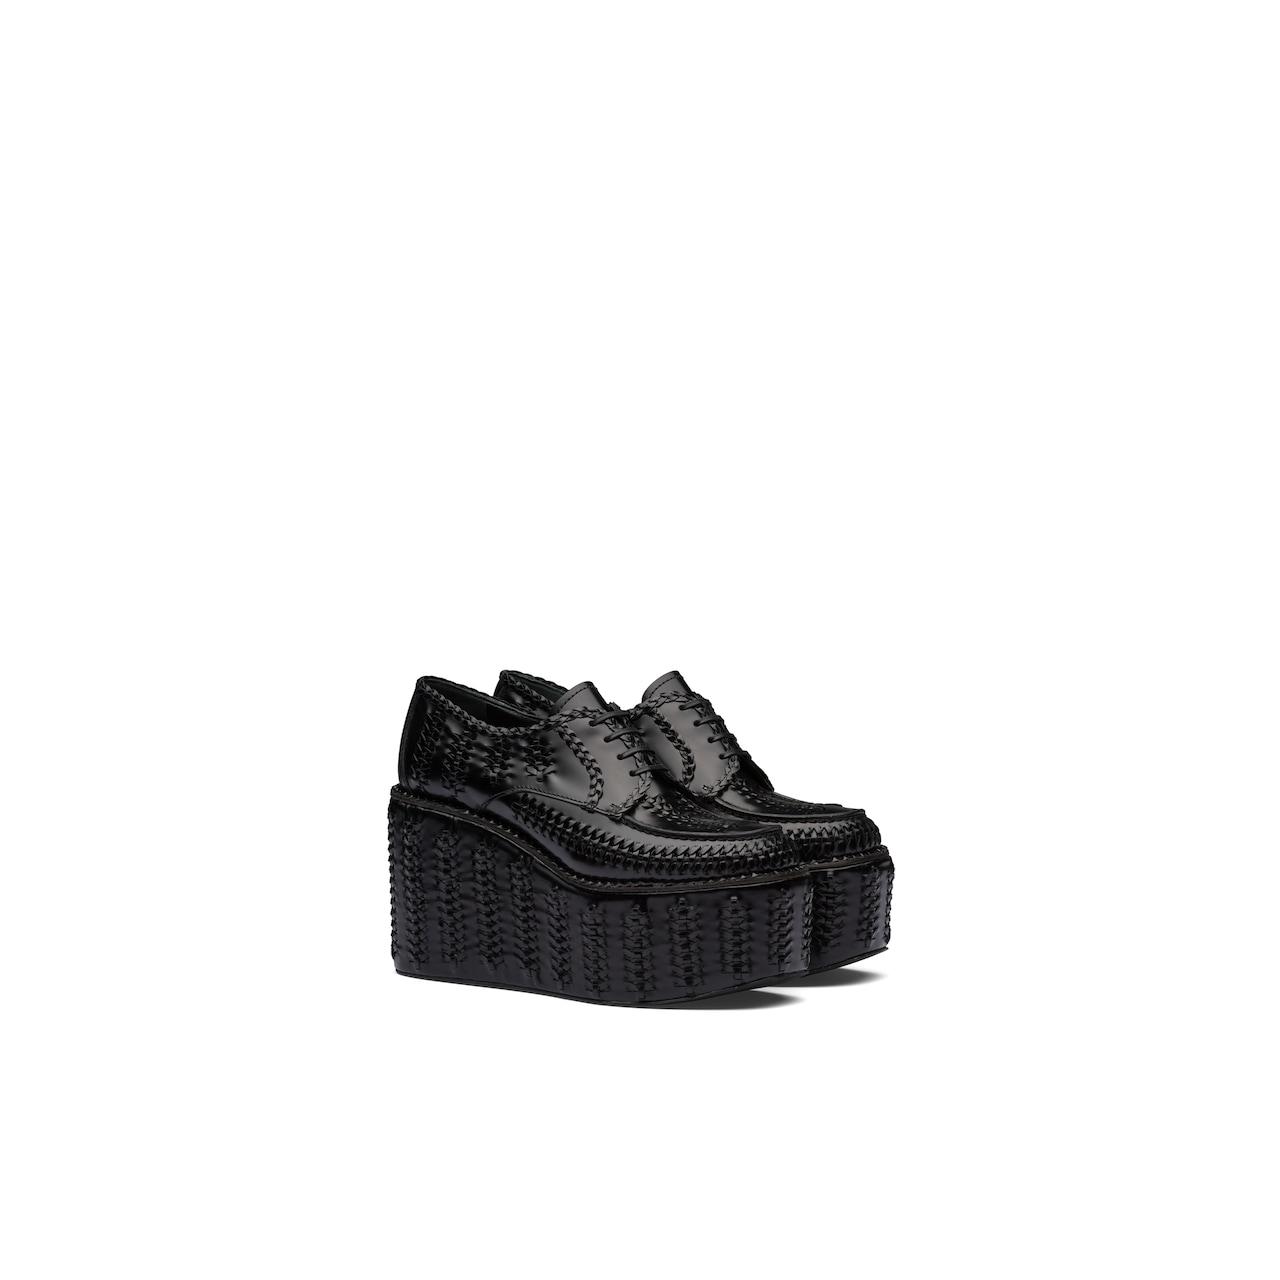 Prada 亮面皮革系带鞋 1